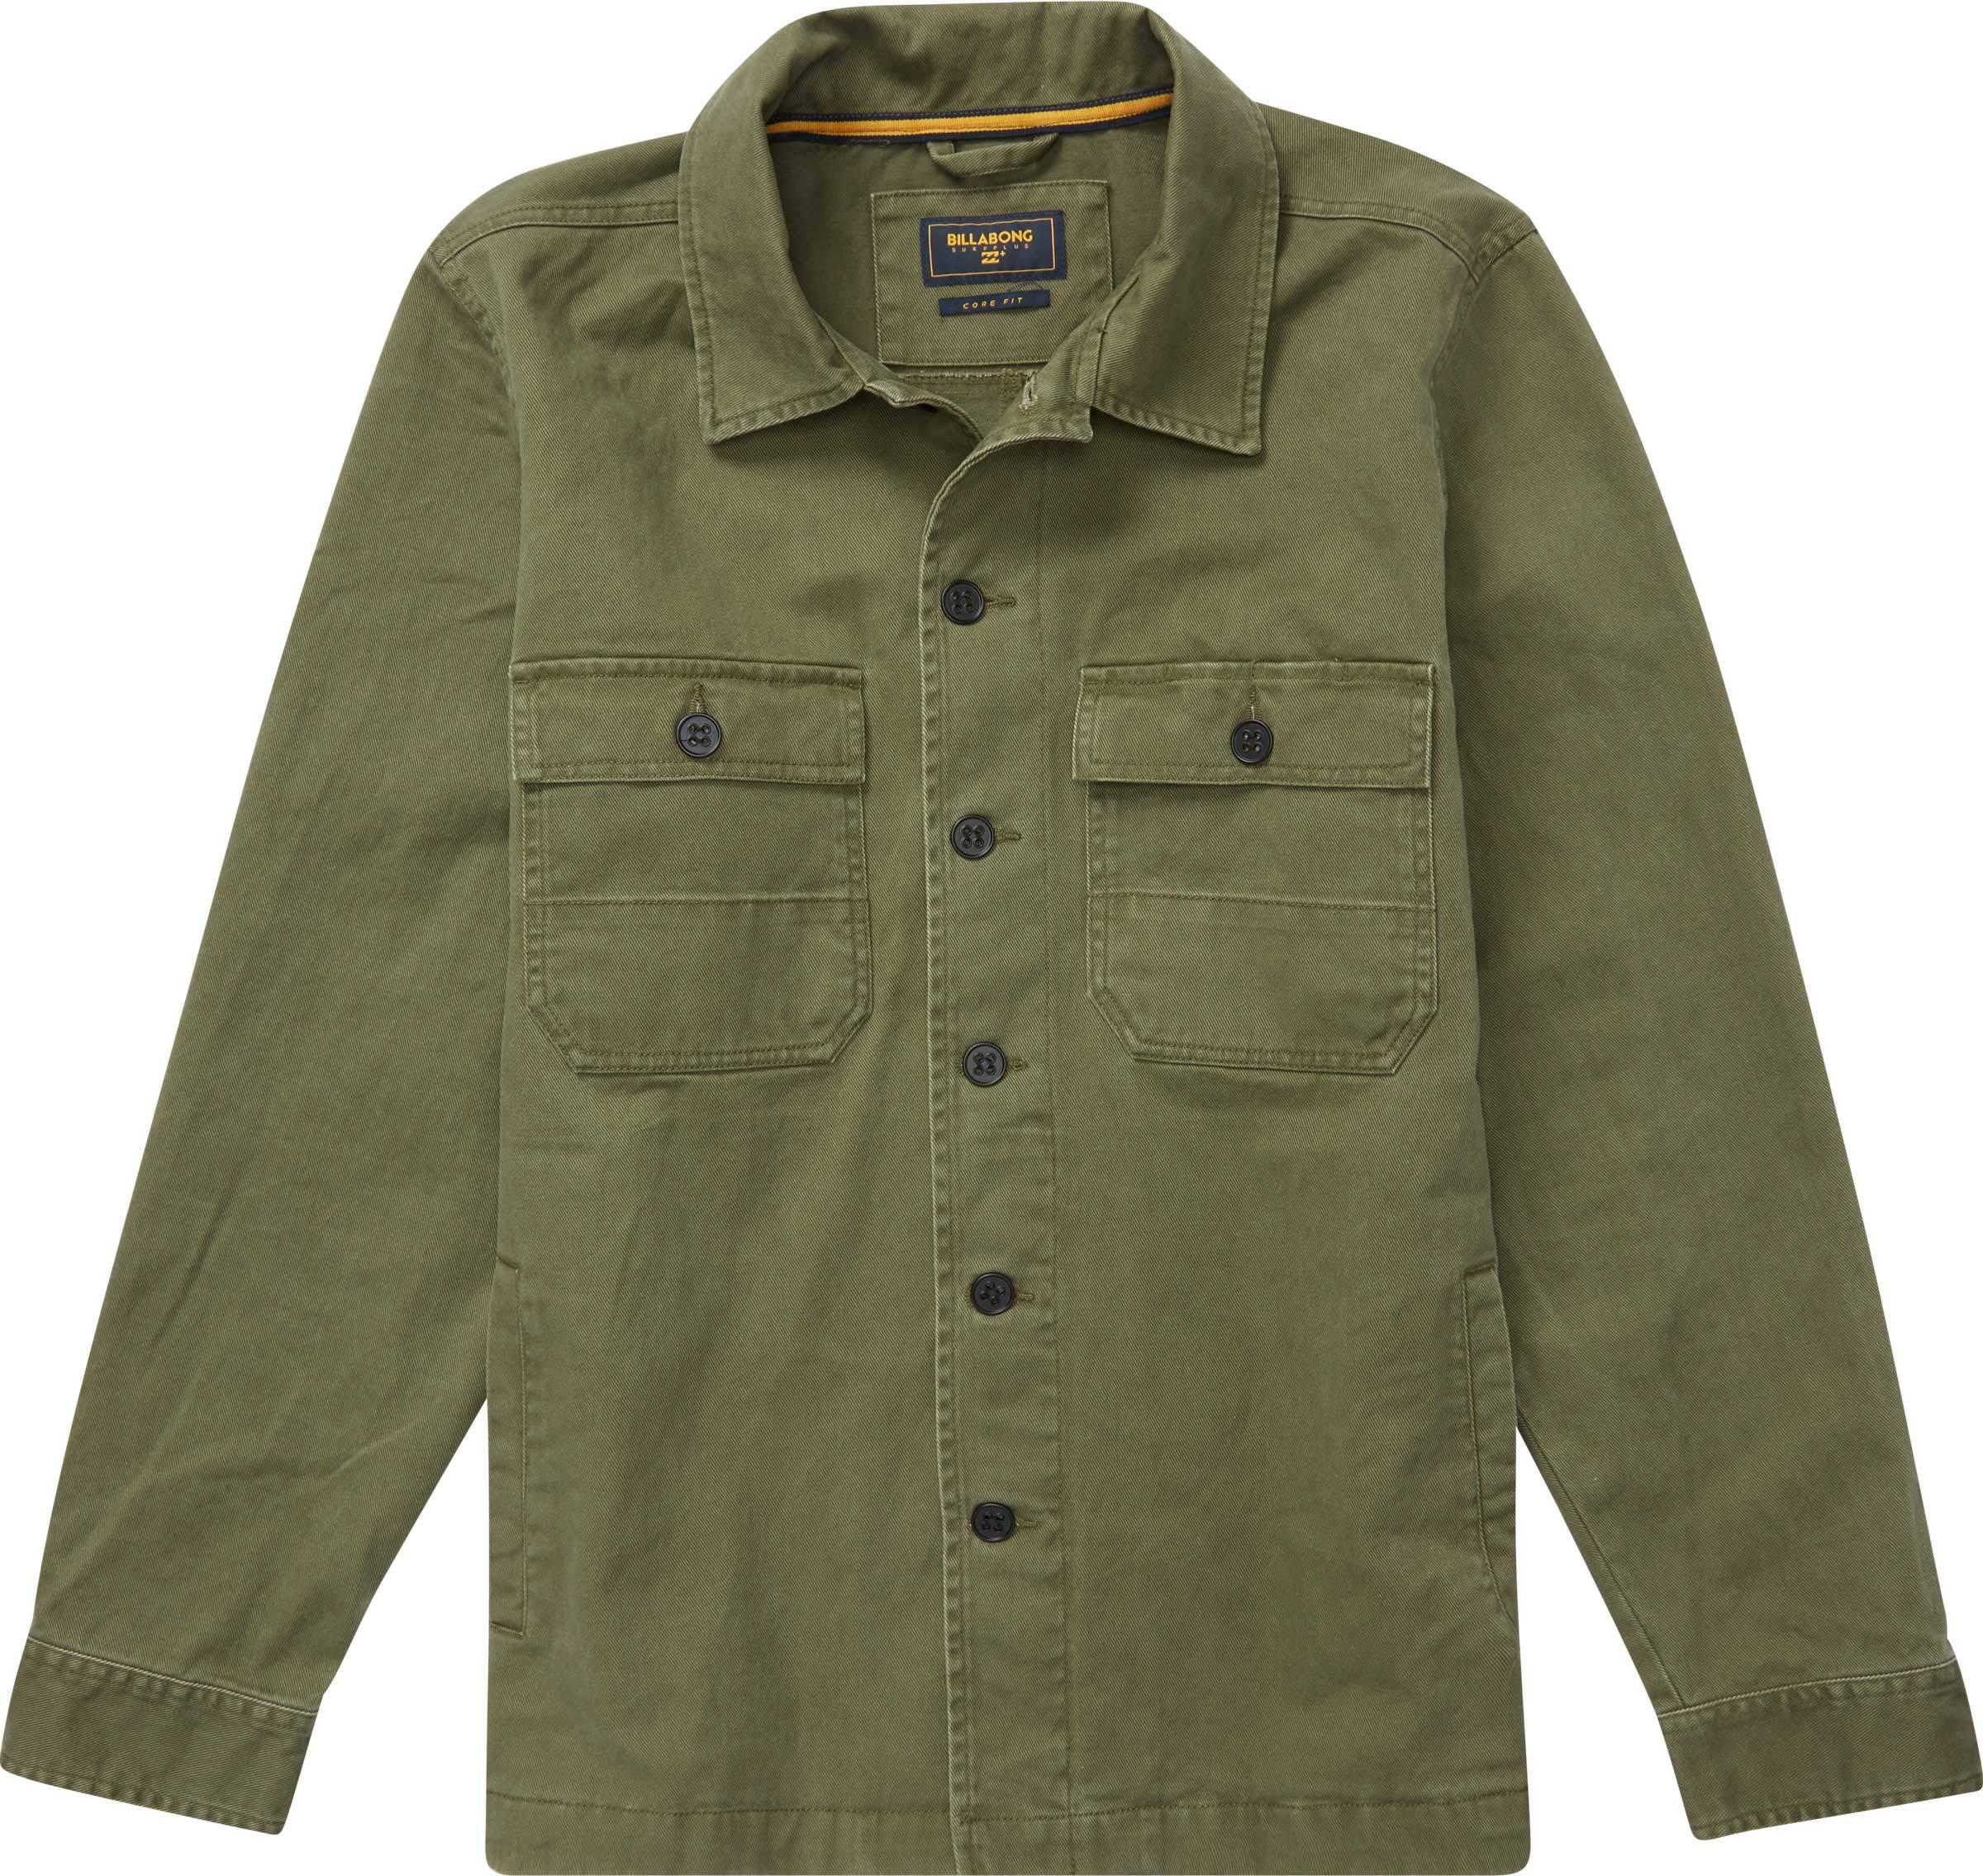 Billabong Men's Collins Jacket Military Large by Billabong